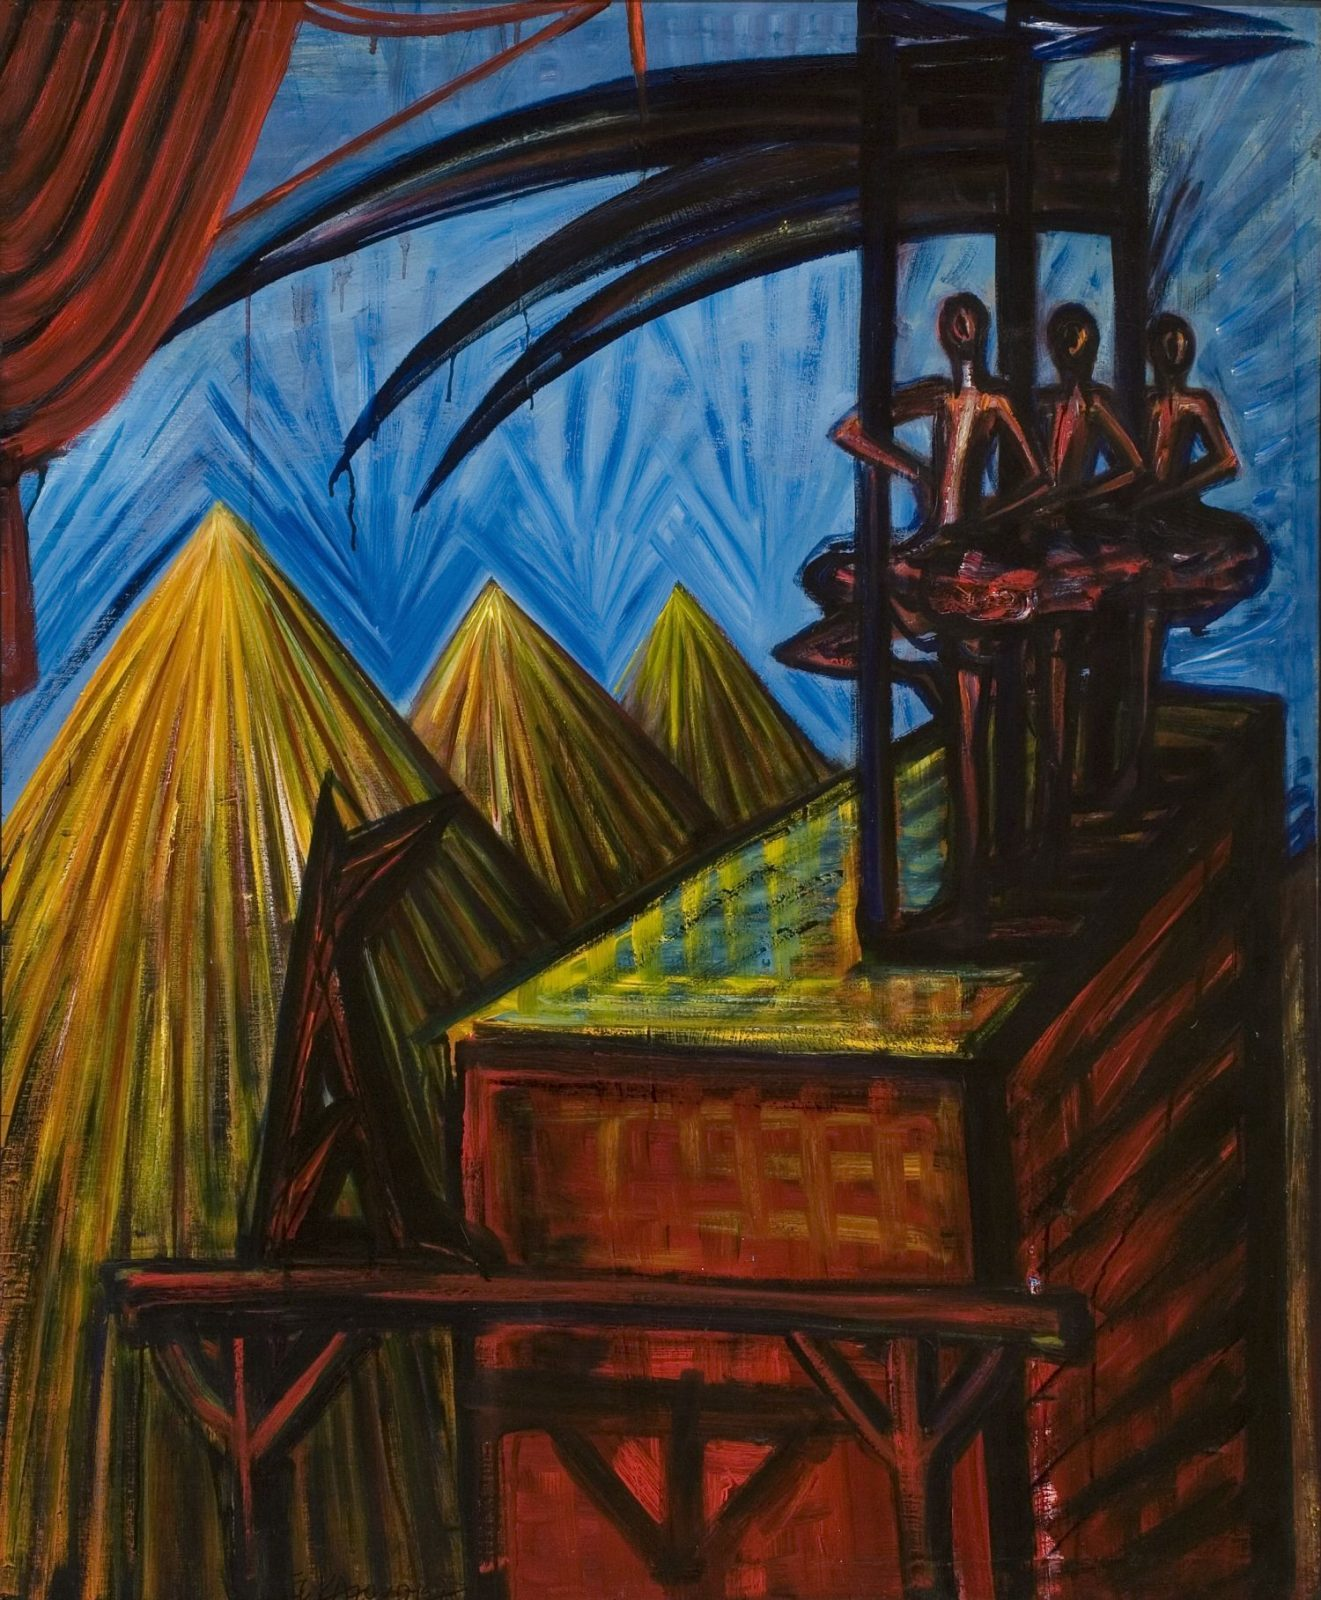 El Kazovszkij: Untitled (Parcae with Scythes)